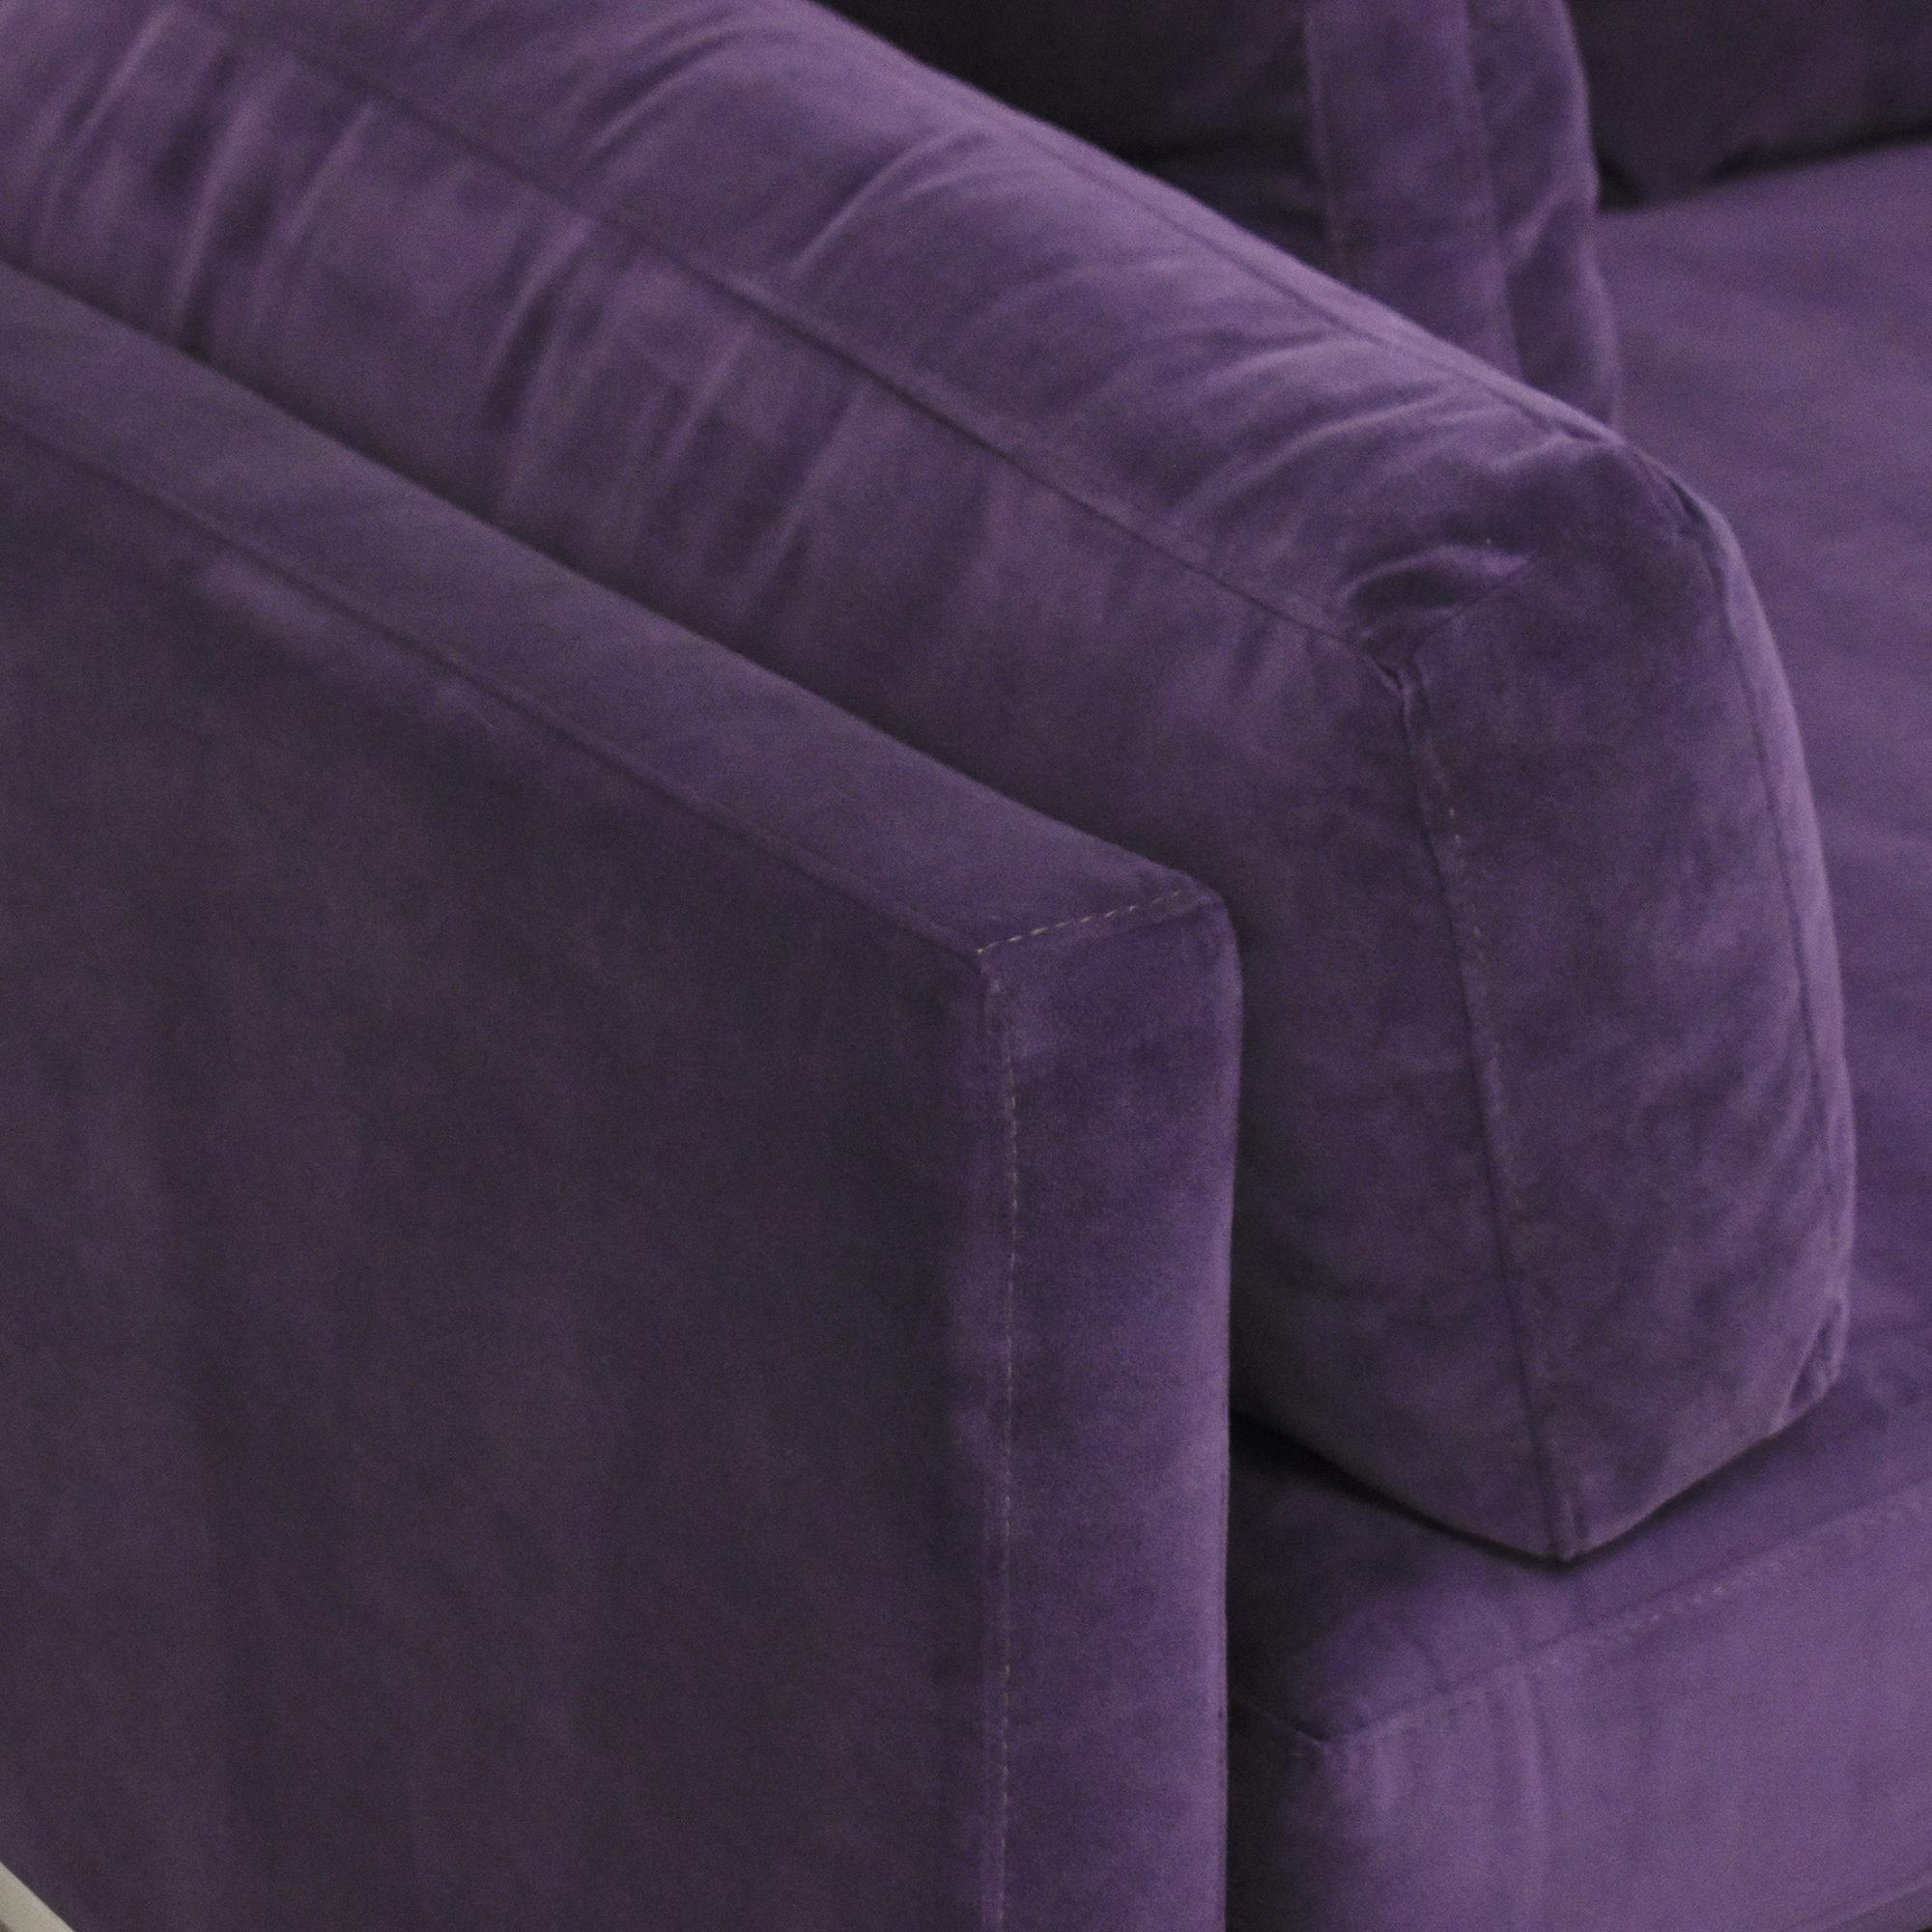 Z Gallerie Z Gallerie Ventura Extra Deep Sectional Sofa on sale